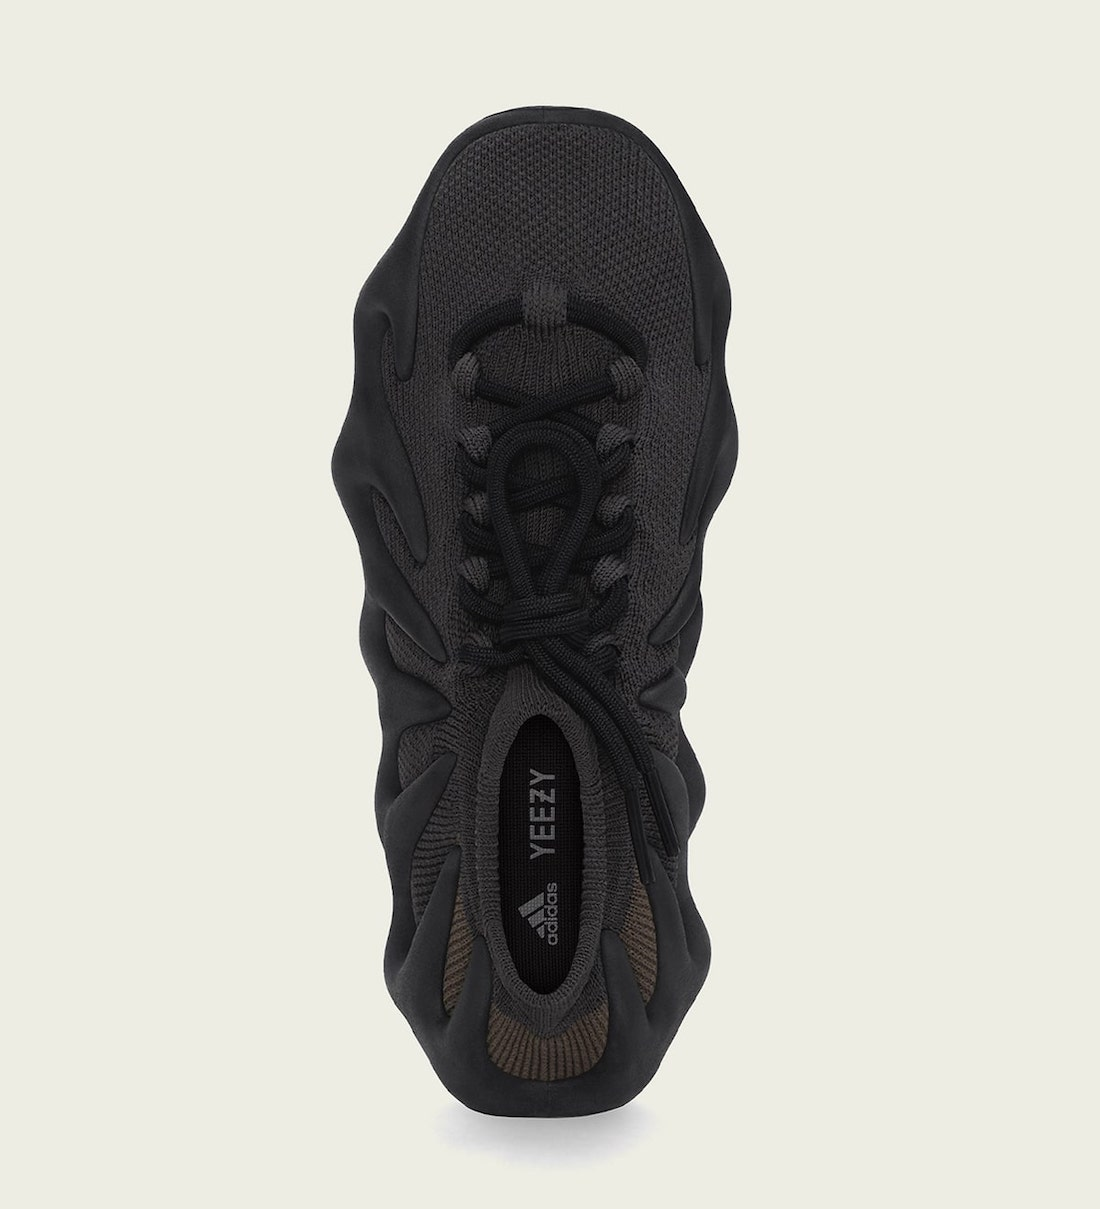 adidas-Yeezy-450-Dark-Slate-GY5386-Release-Date-Price-3